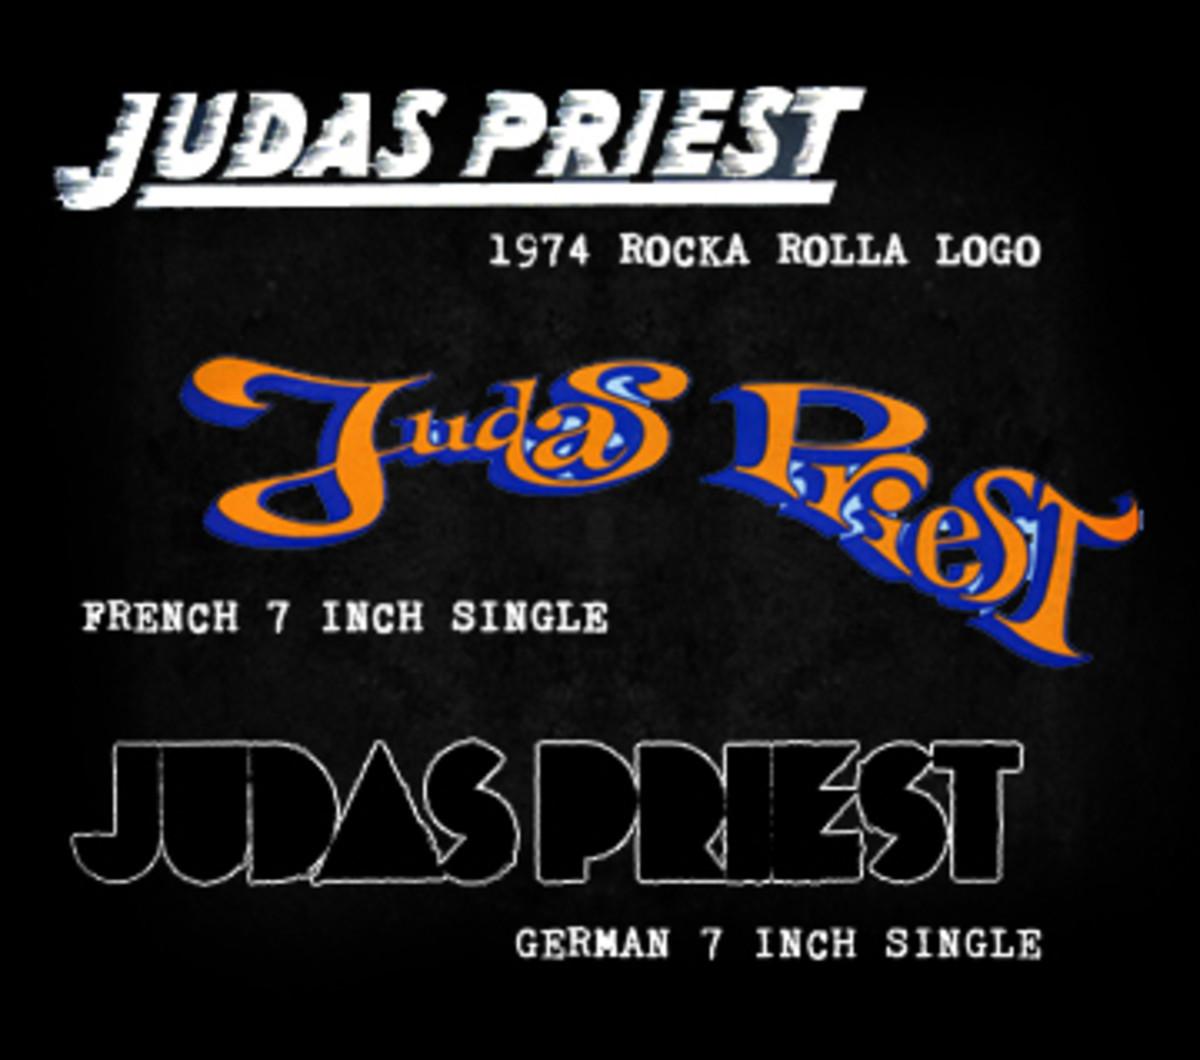 judas-priest-band-history